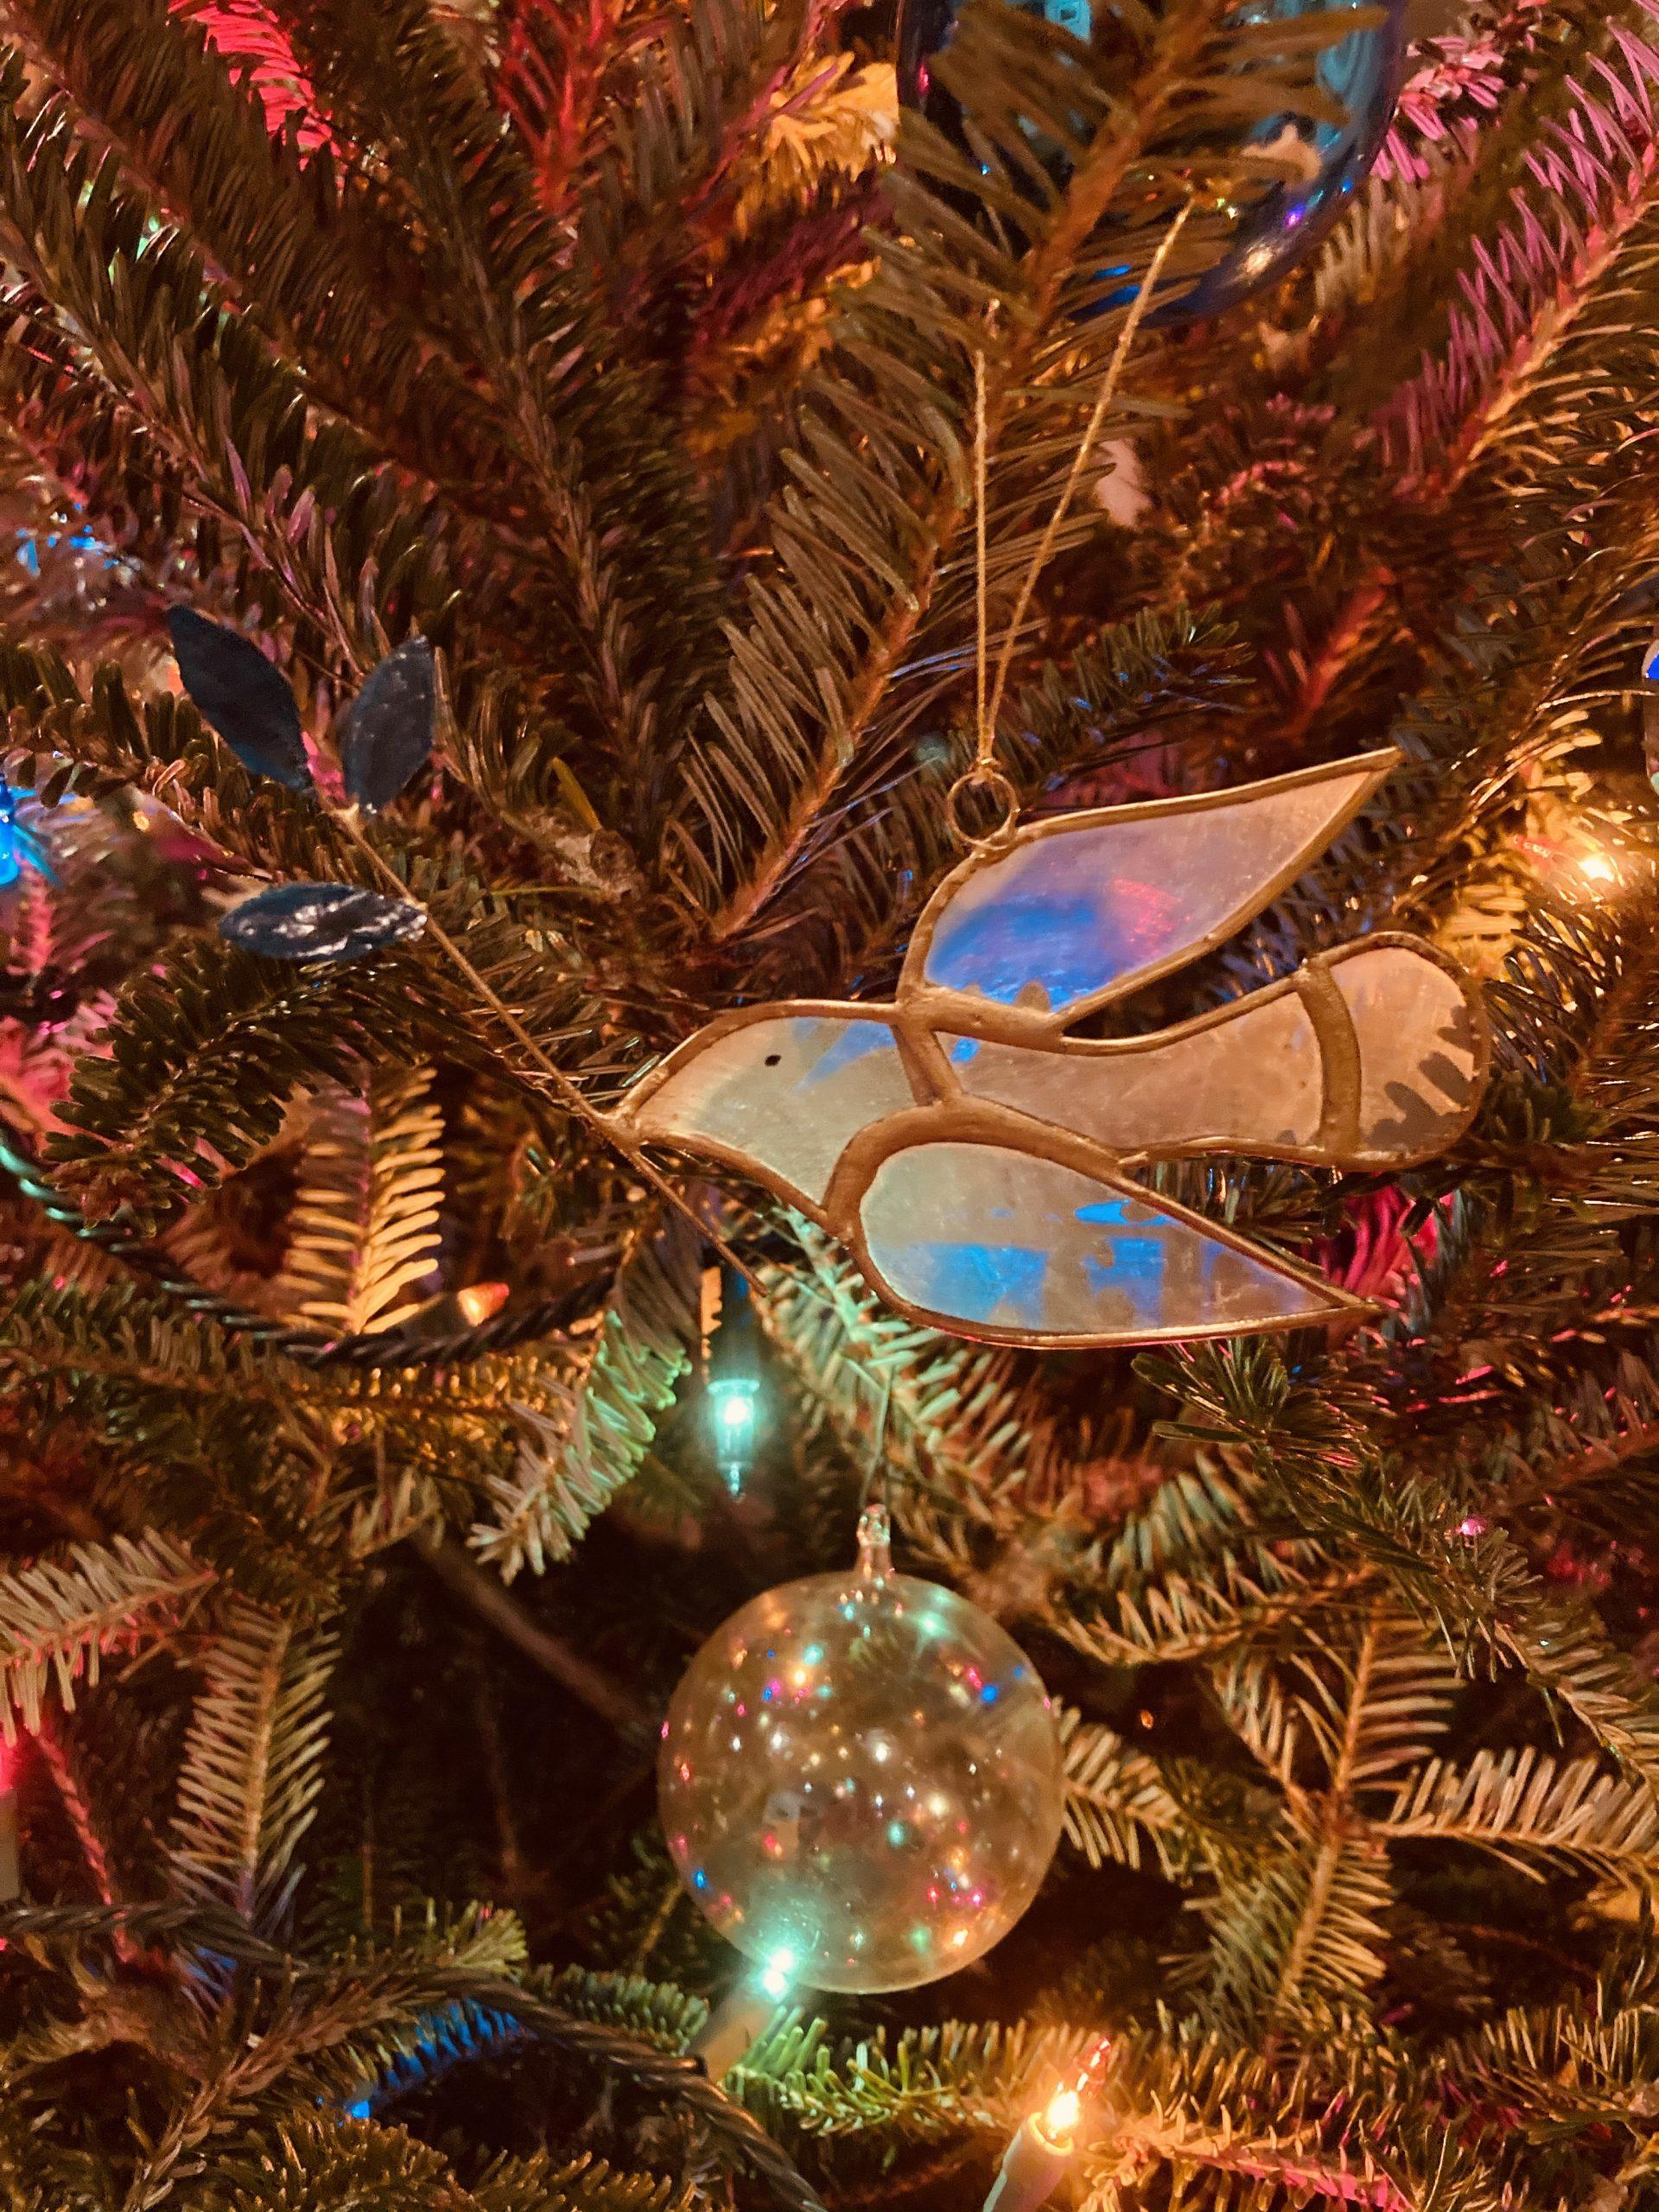 Peace Dove on Christmas Tree, by David B. Coe